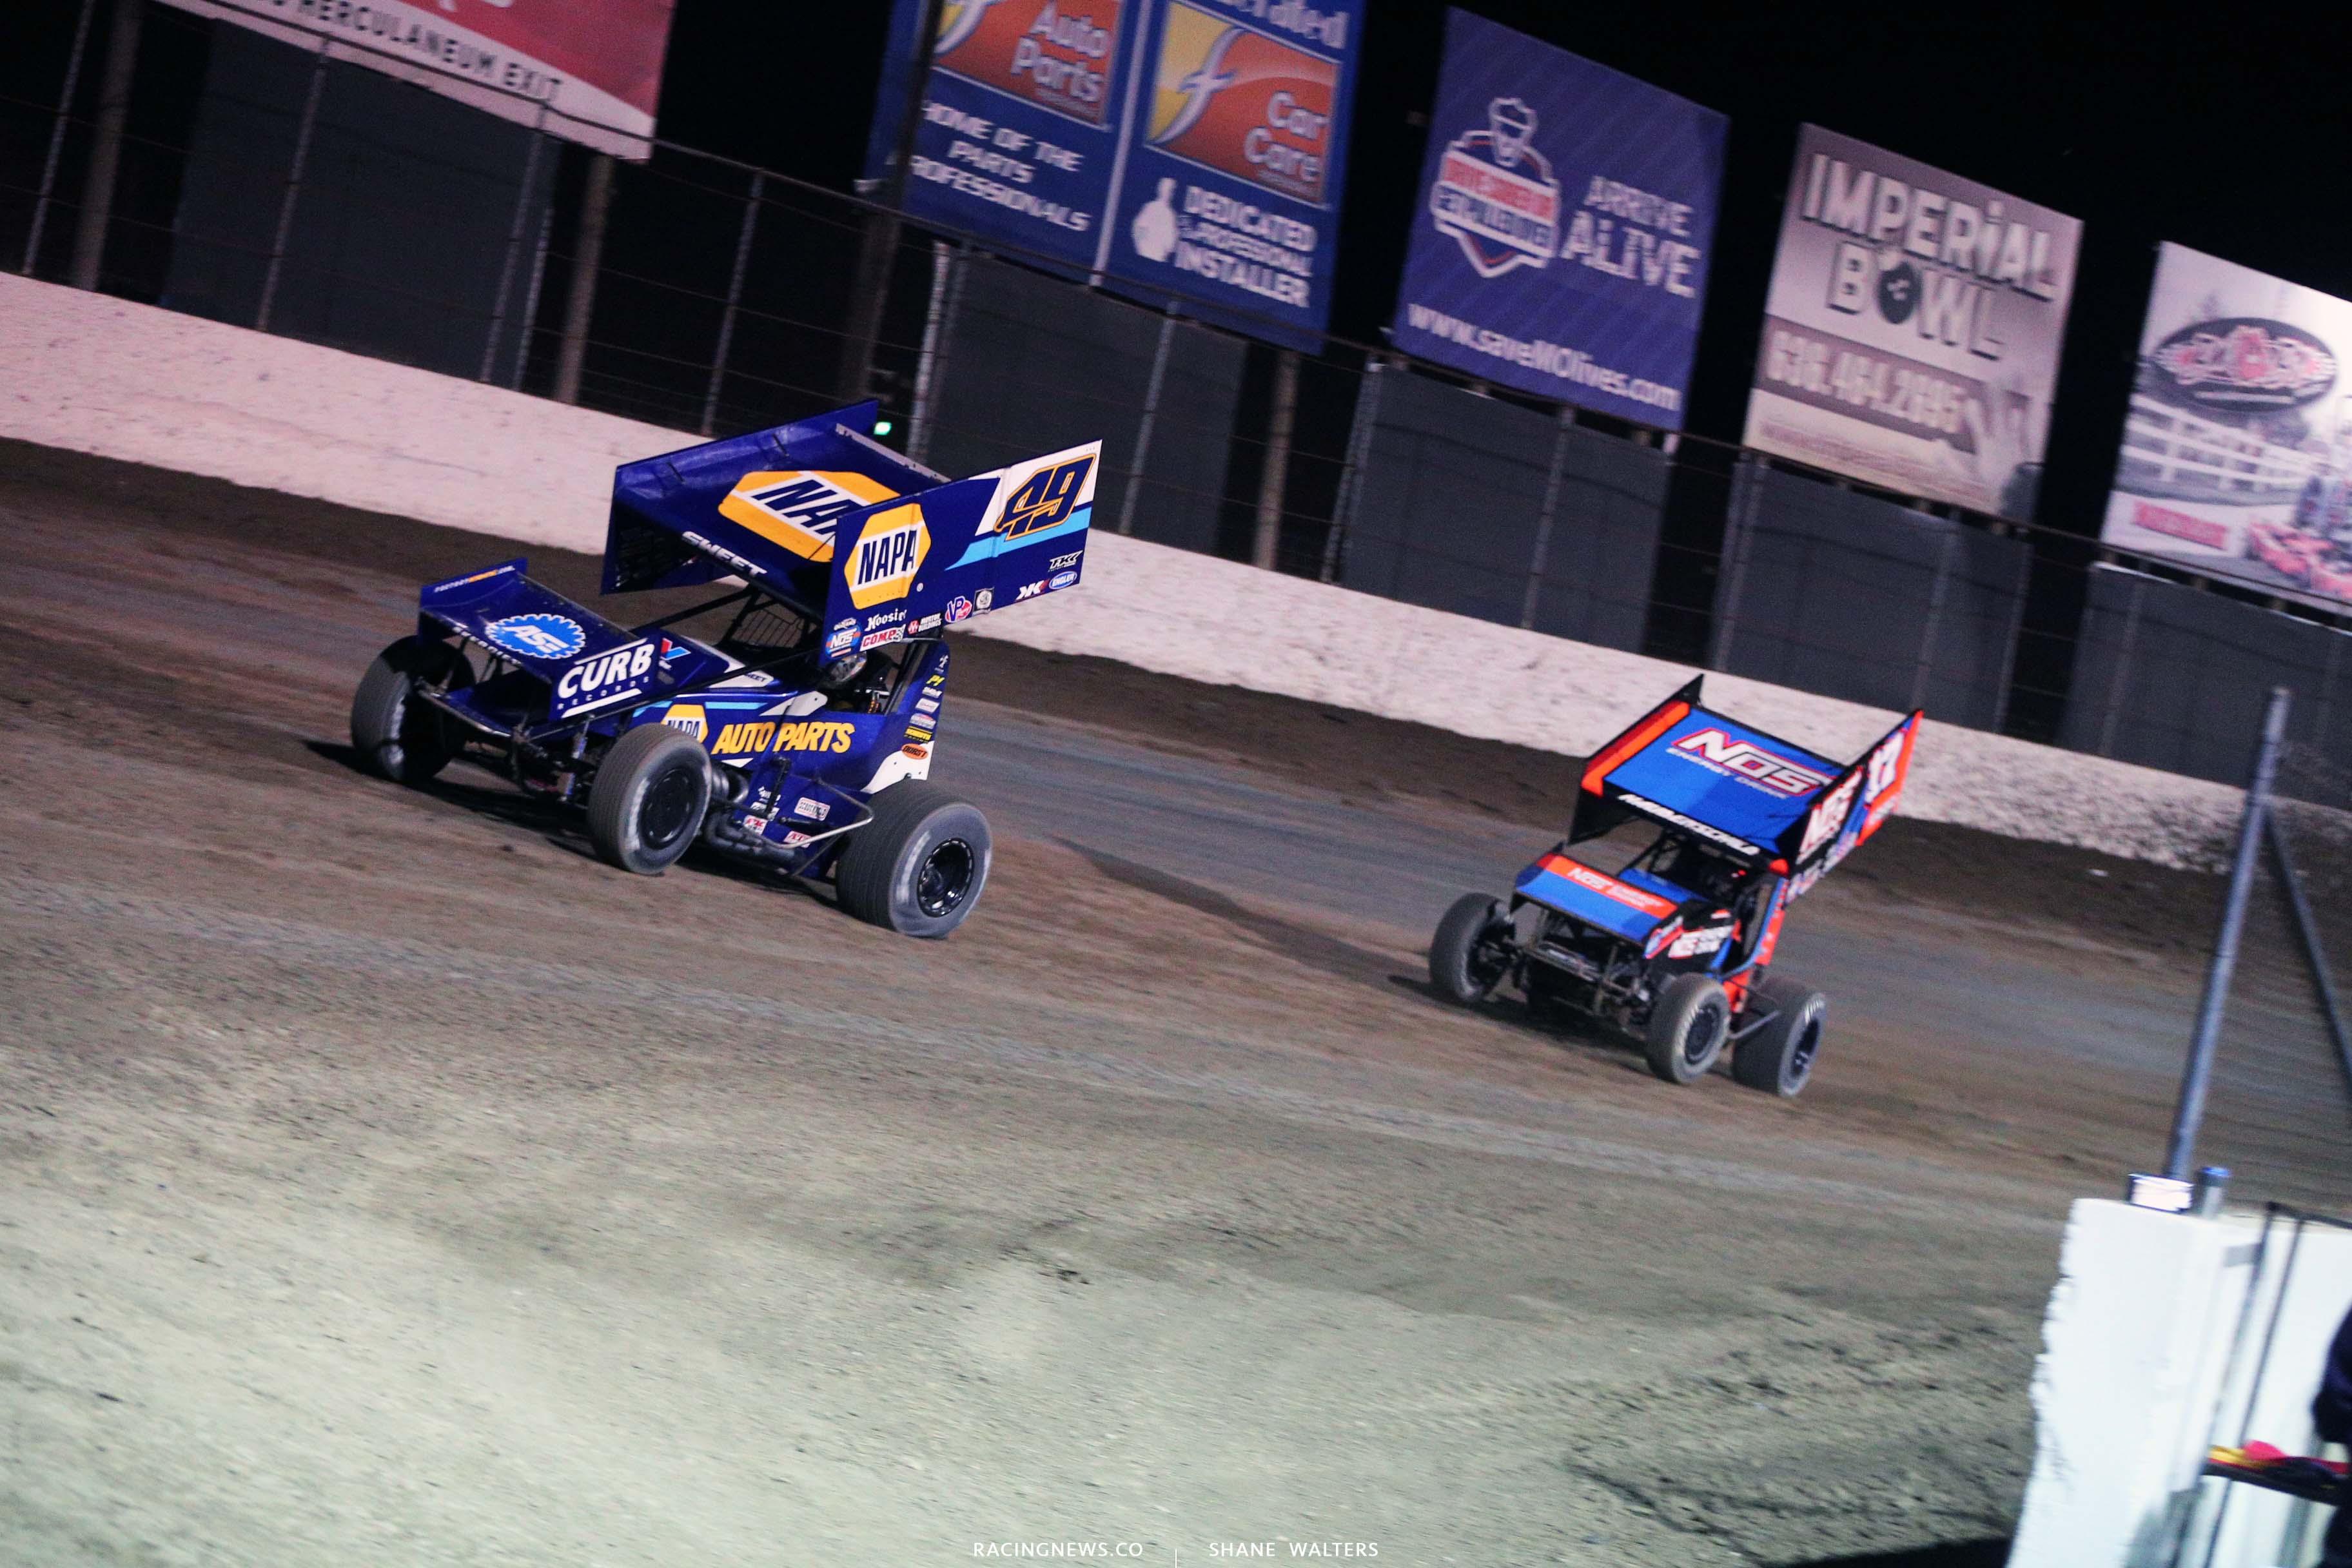 Brad Sweet and Sheldon Haudenschild - World of Outlaws Sprint Car Series - I55 Raceway 3432